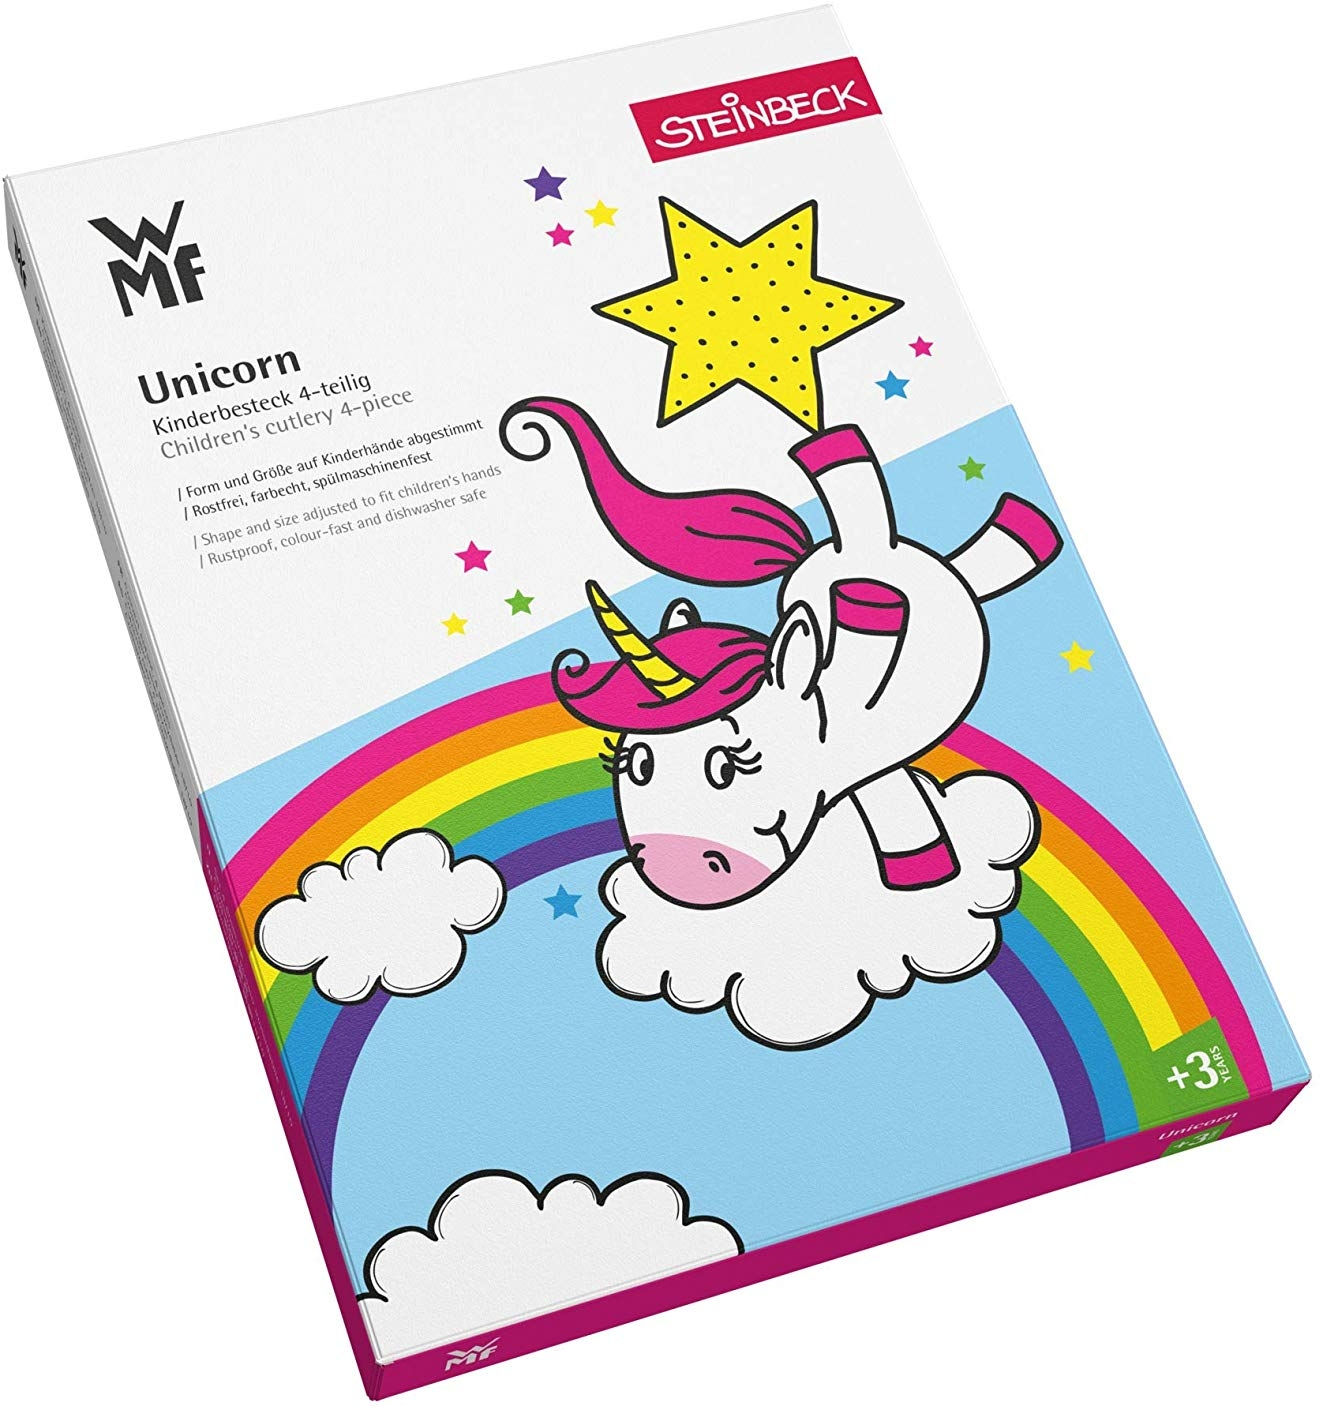 Cubertería infantil de acero inoxidable, 4 piezas, WMF Unicornios caja